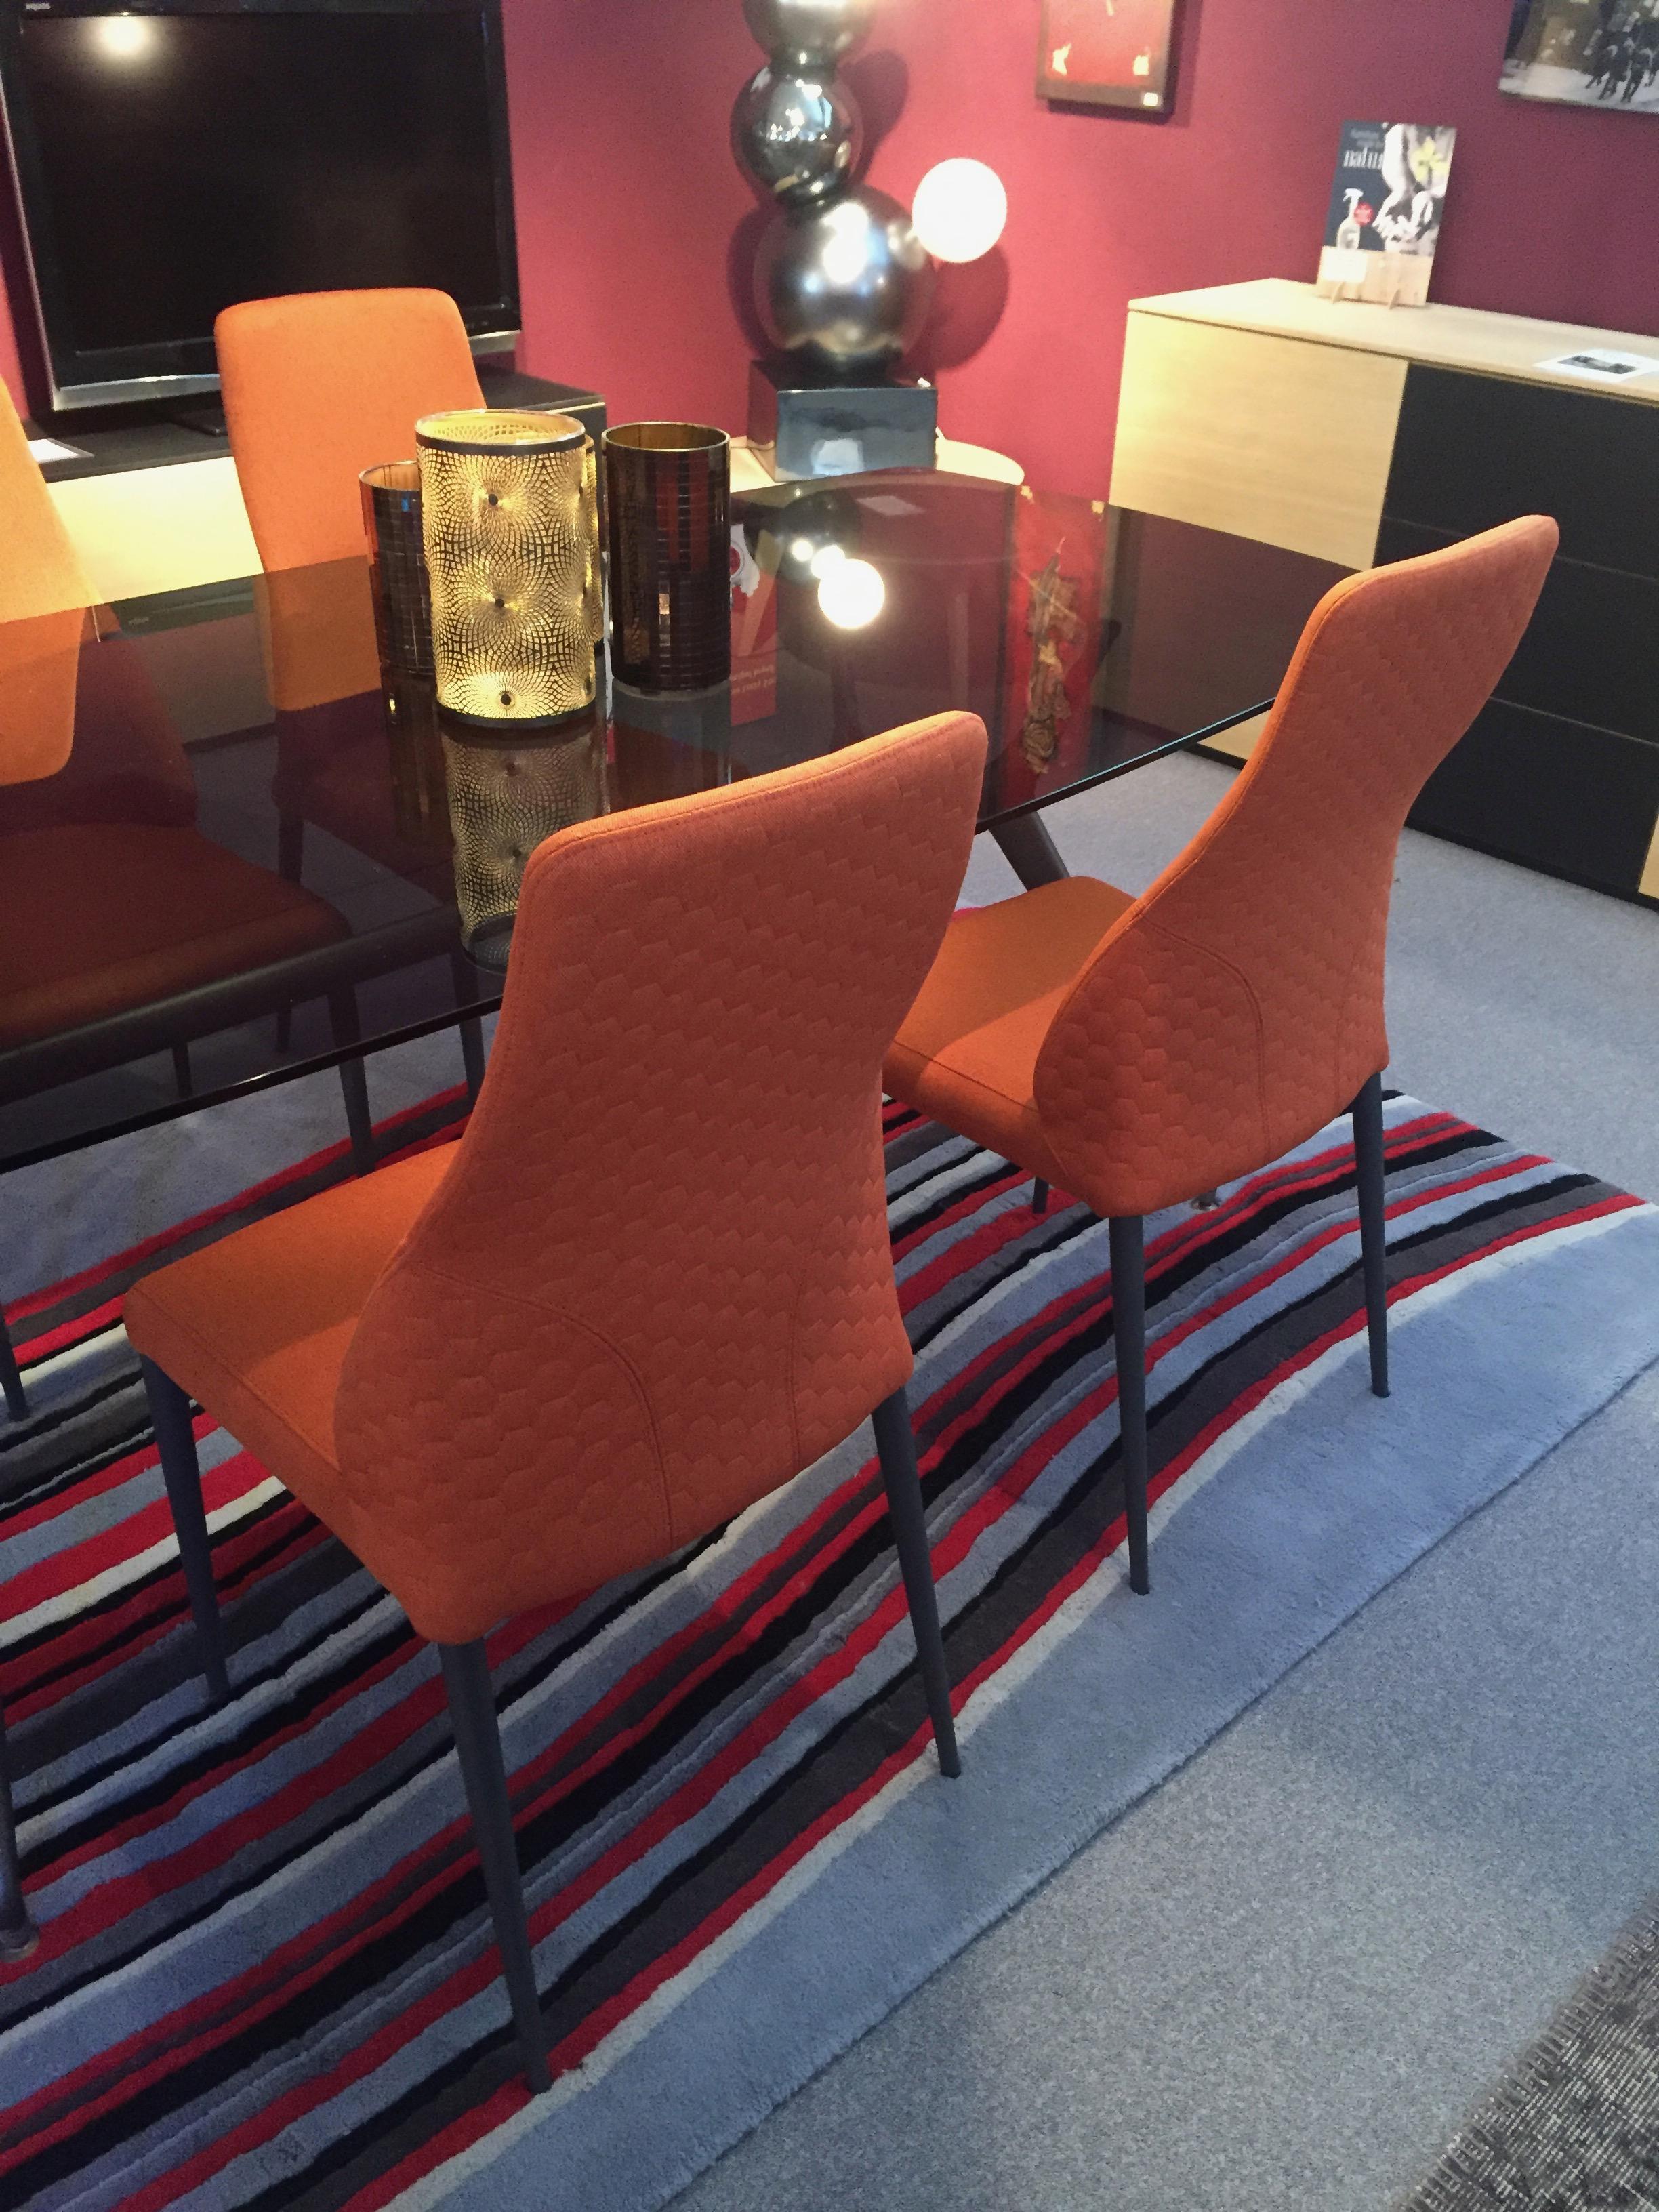 Chaise mathilde meubles steinmetz - Meuble mathilde ...